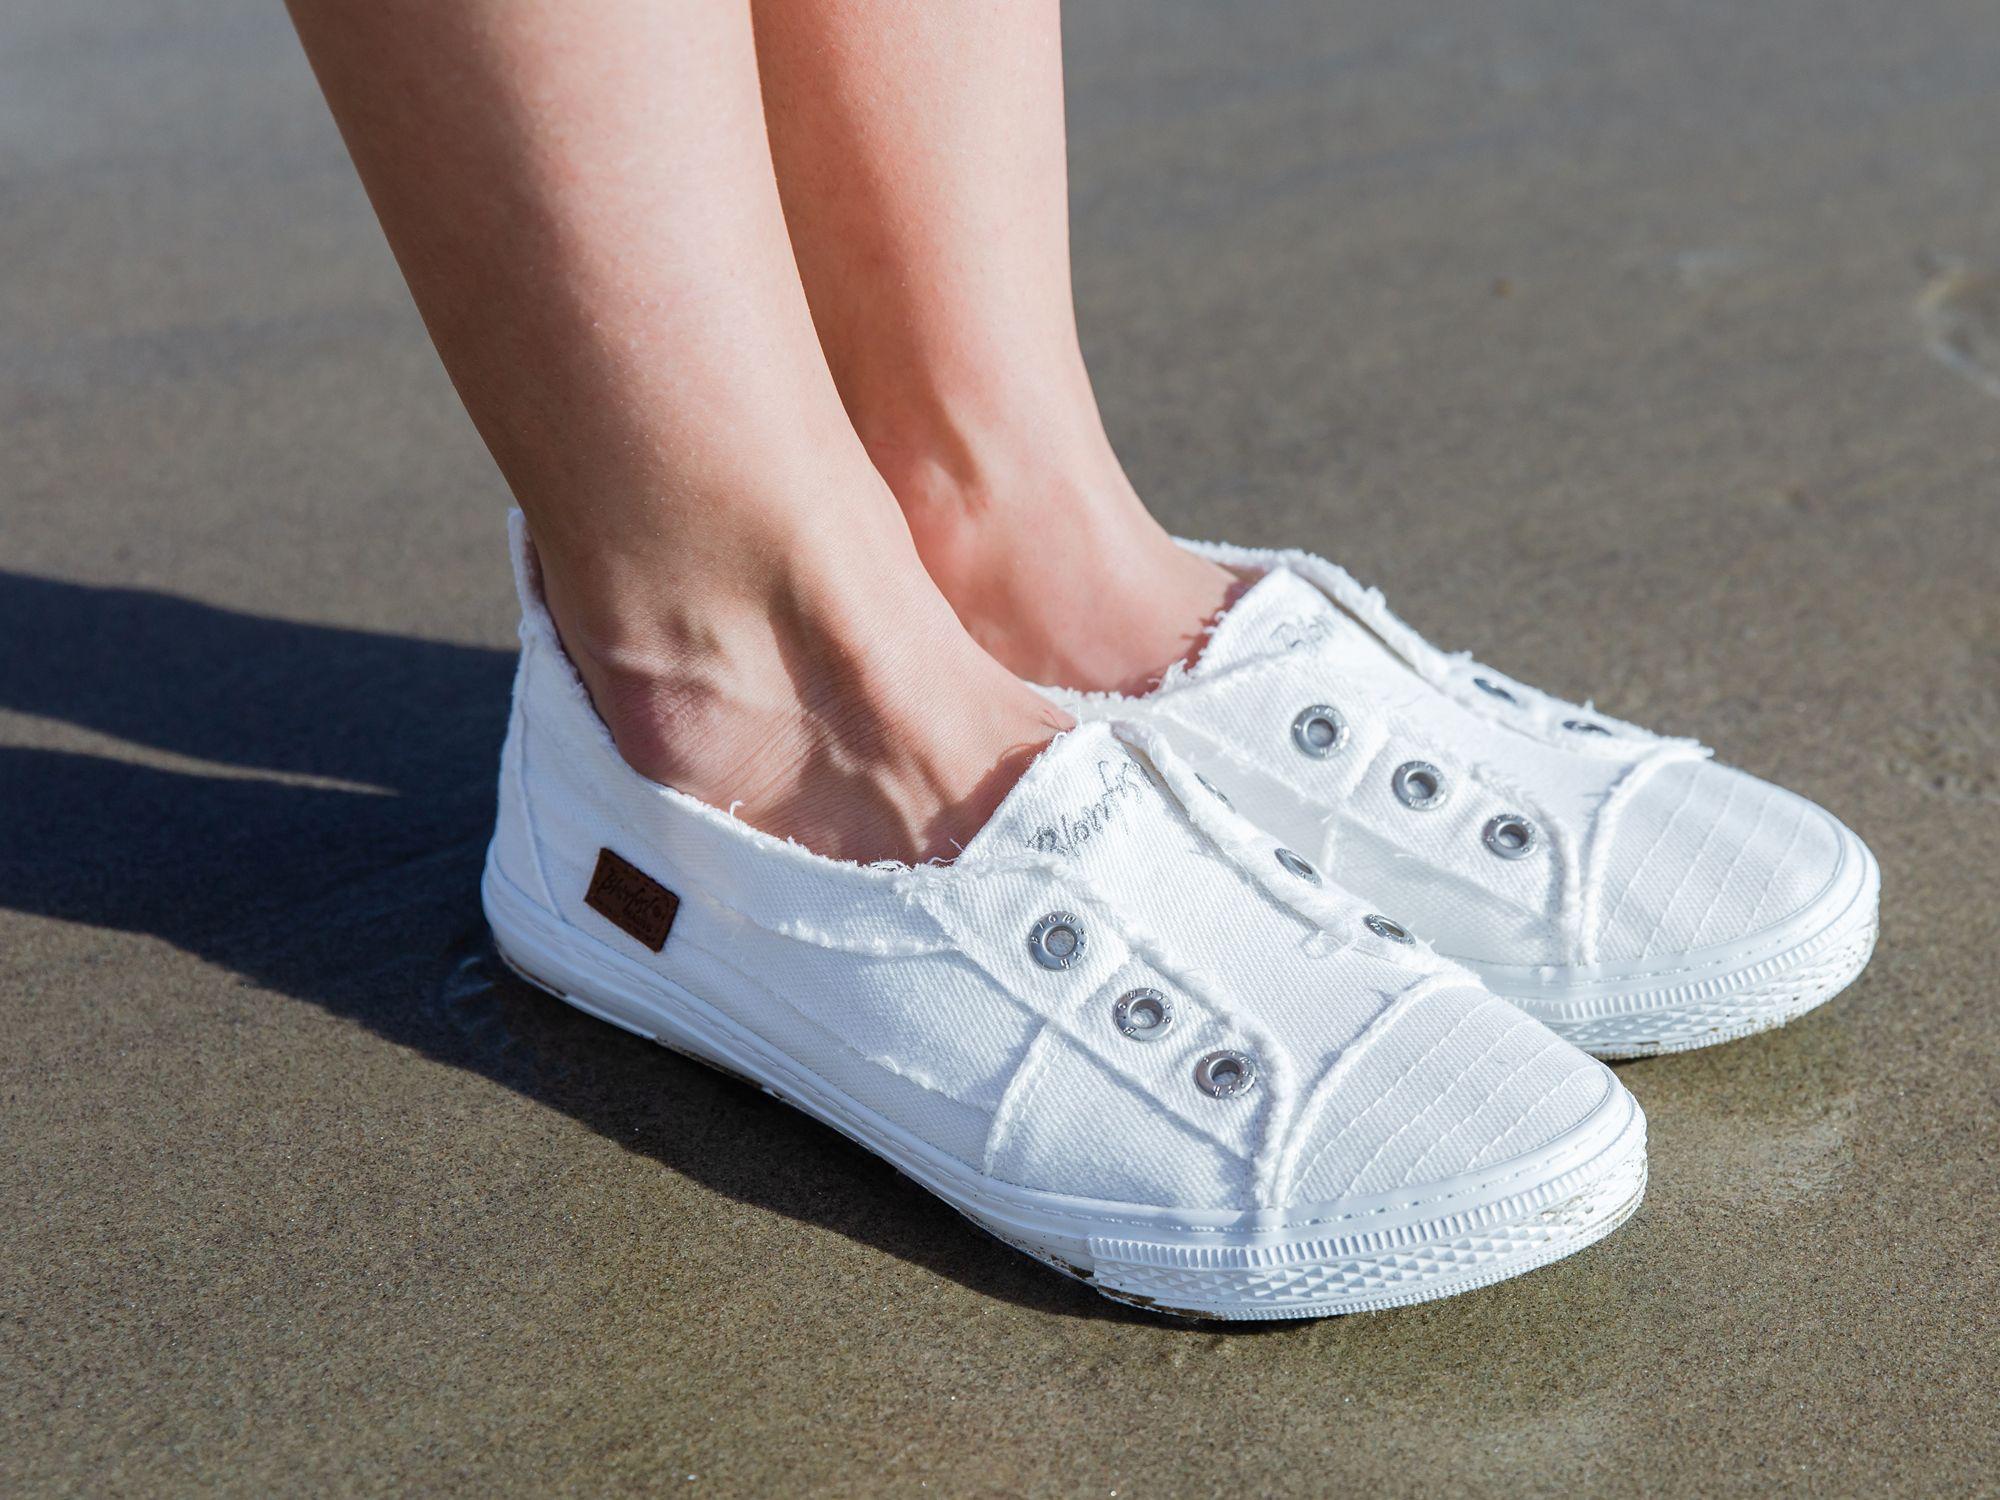 Aussie Sneaker, Blowfish Malibu